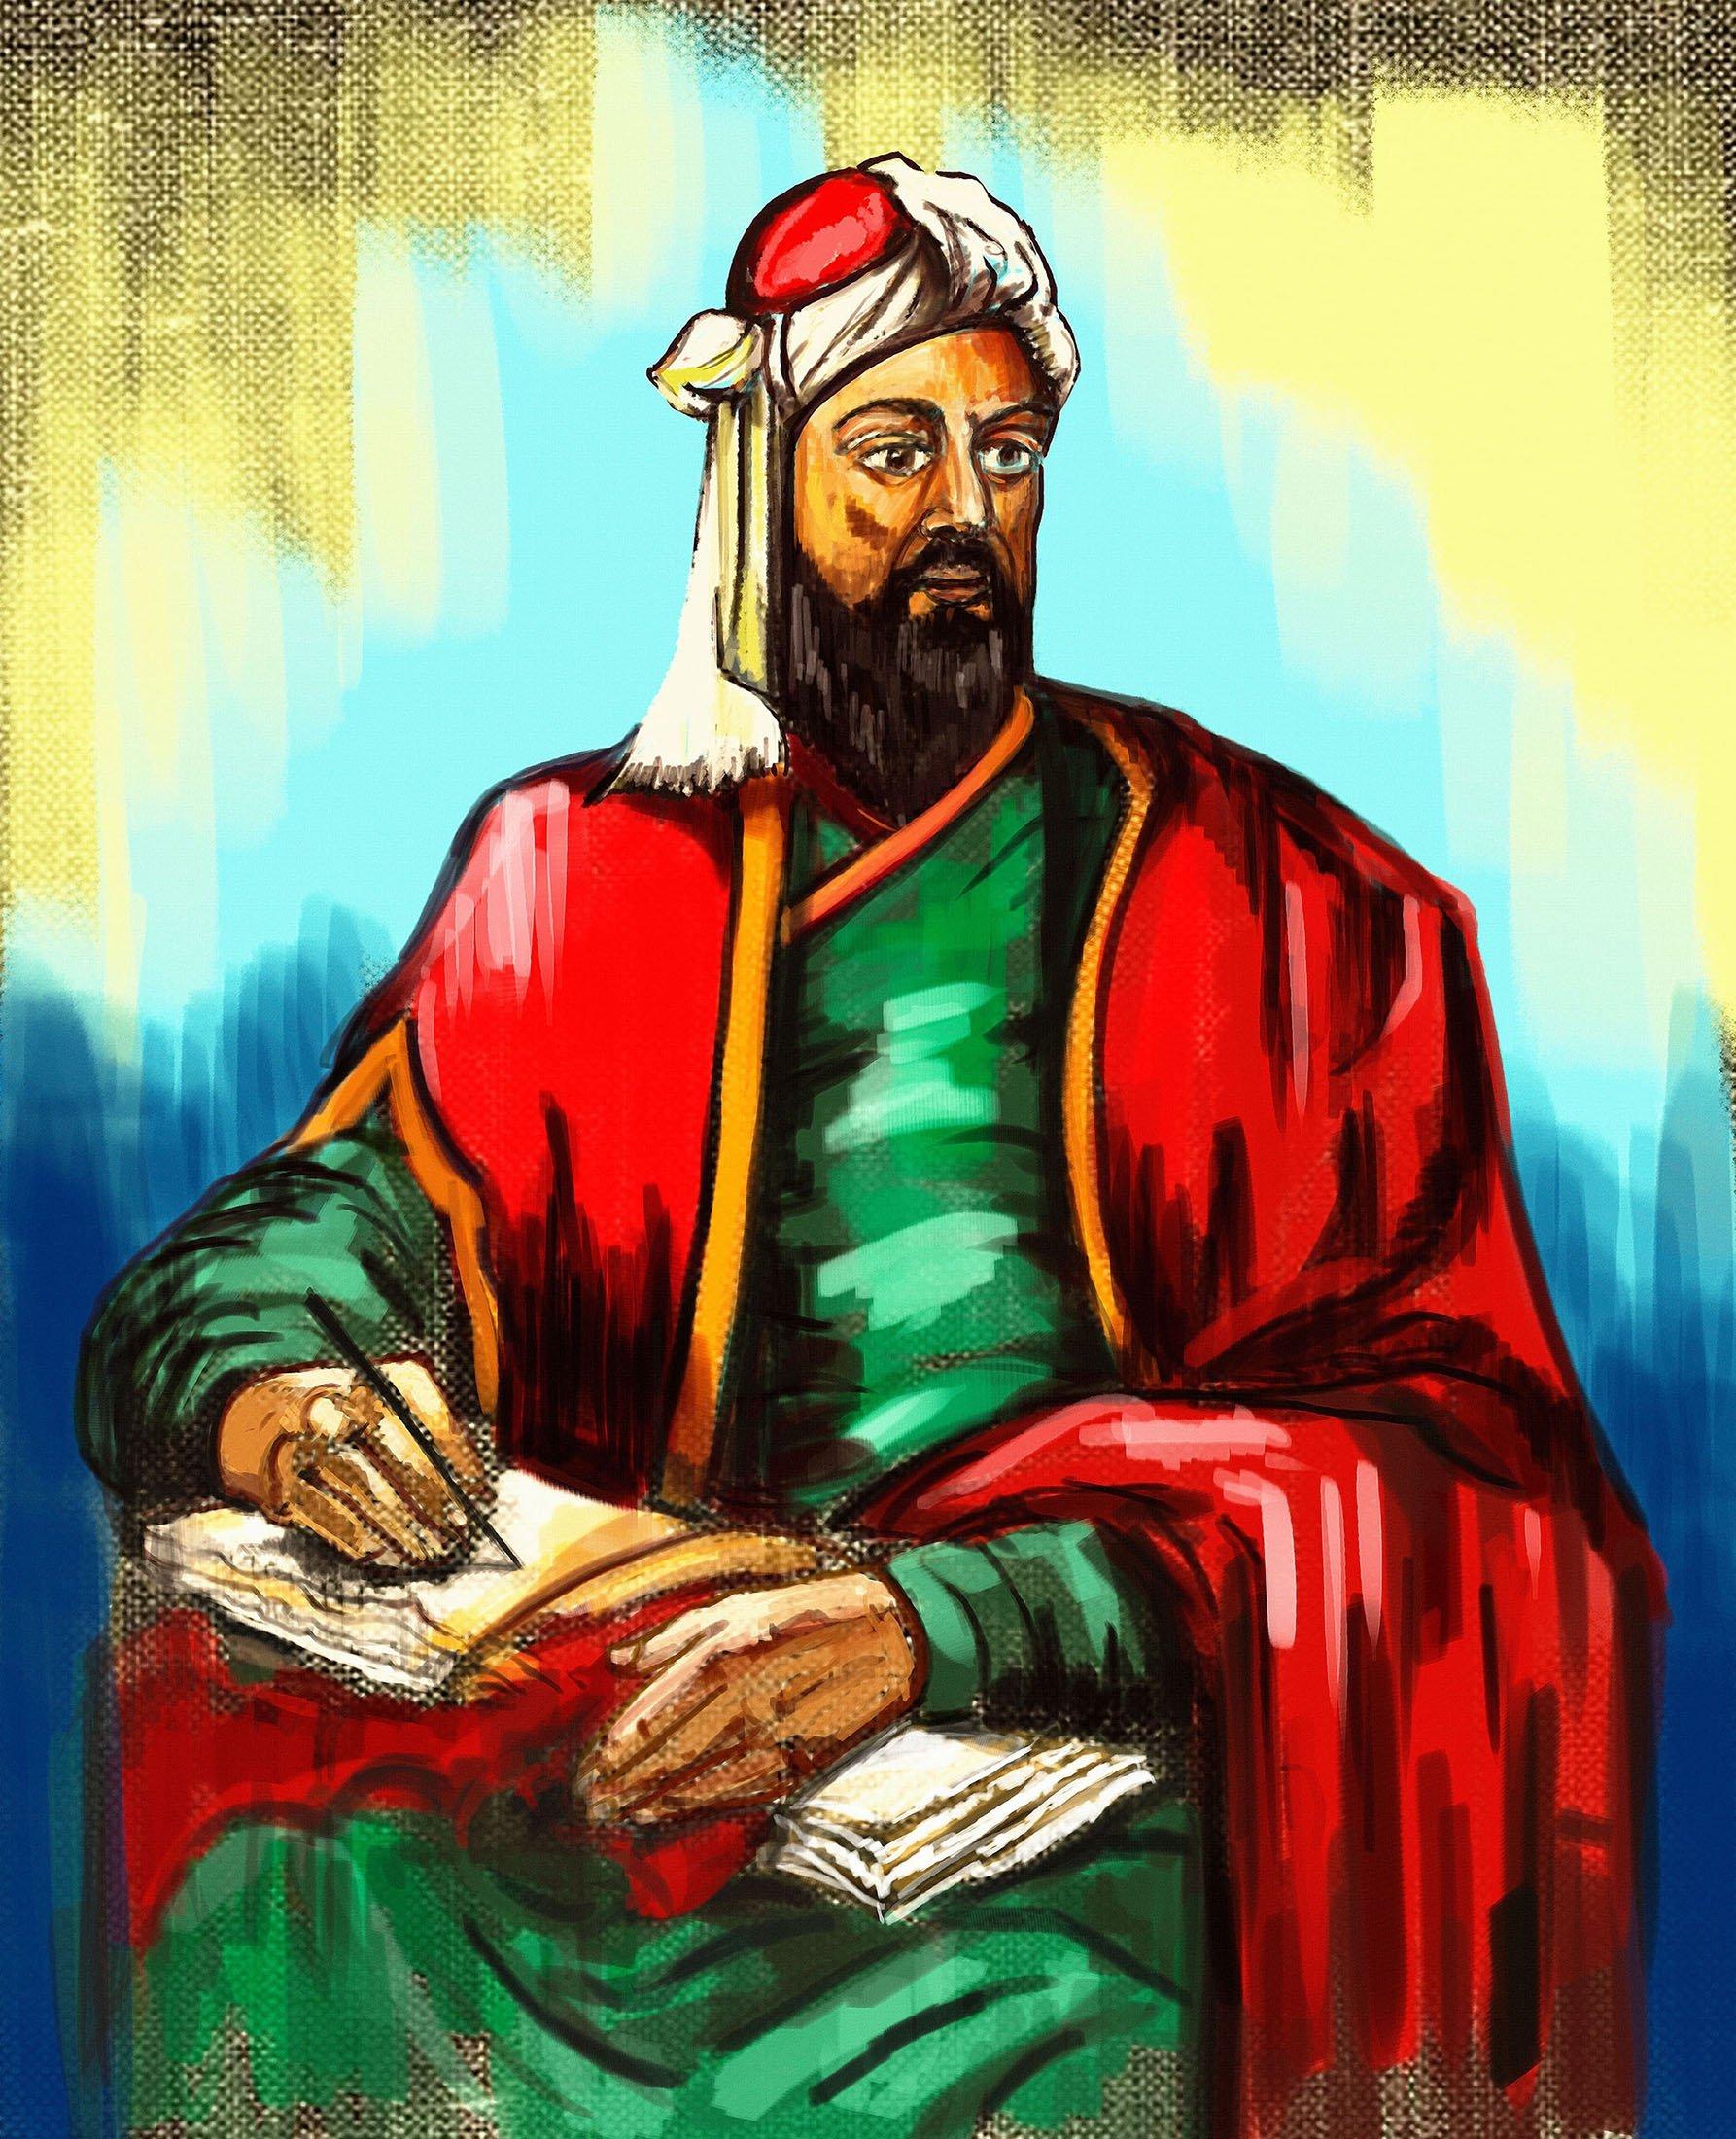 A painting depicts the likeness of Nizam al-Mulk, 11-th century statesman and vizier of the Seljuk Empire. (Shutterstock Photo)